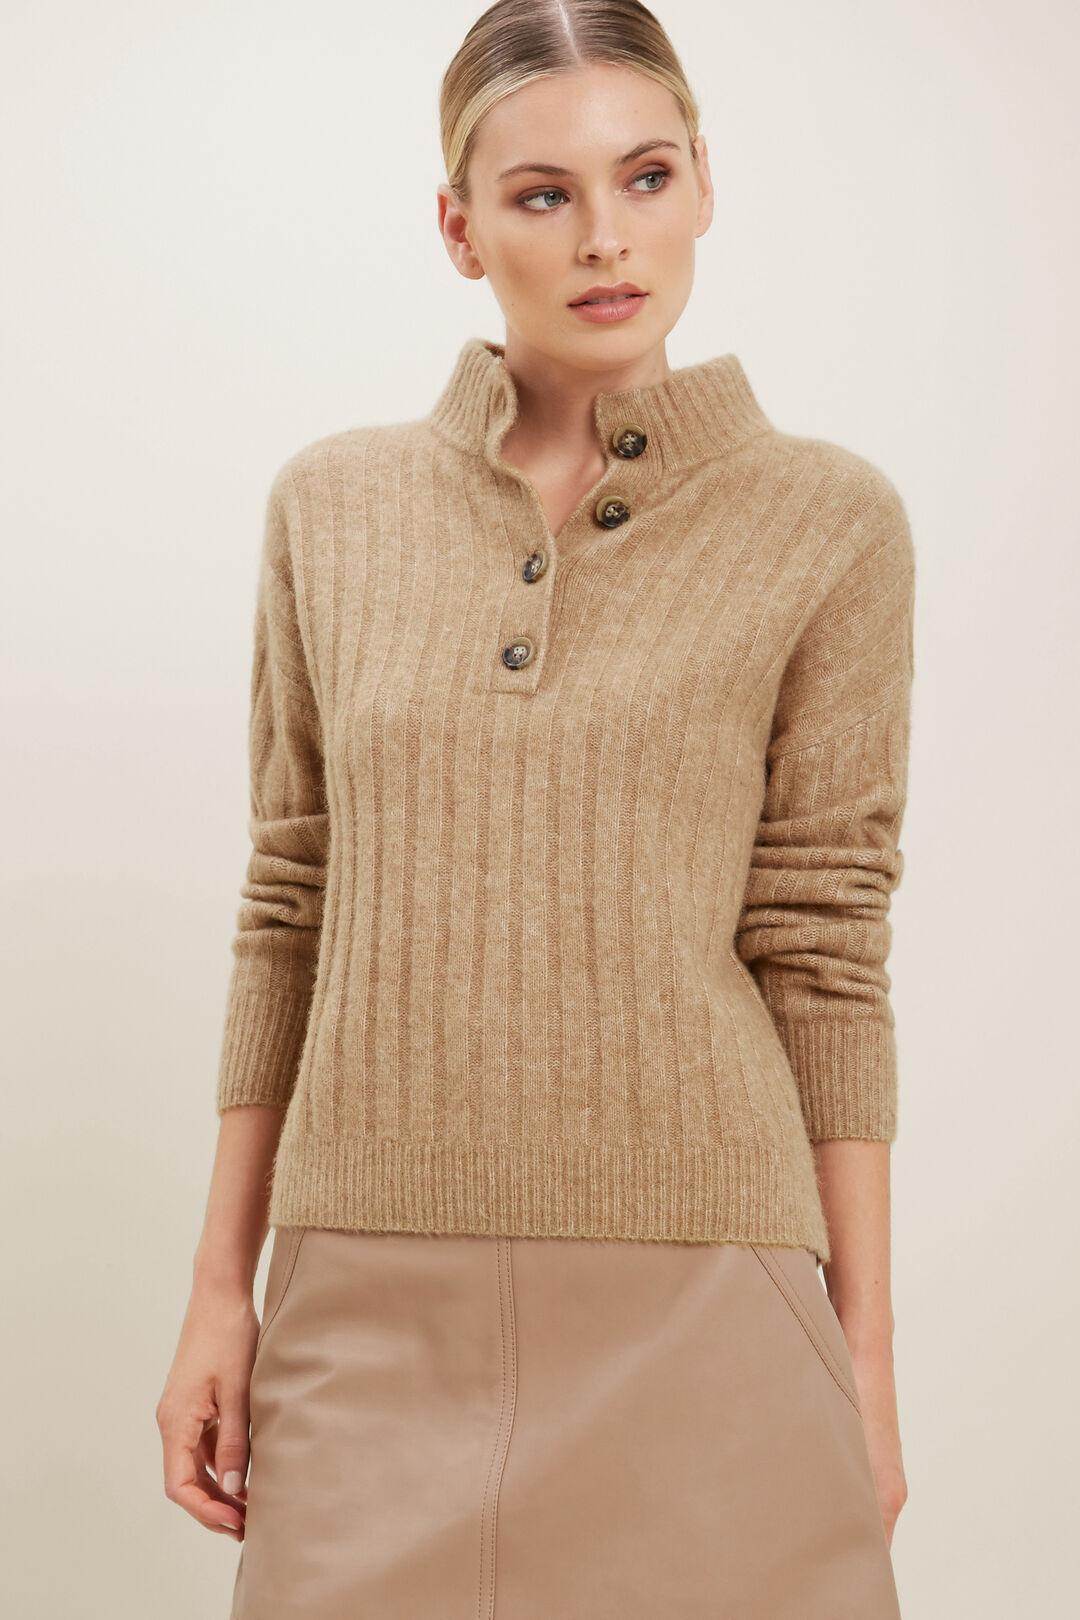 Rib Collared Sweater   HONEY DEW MARLE  hi-res